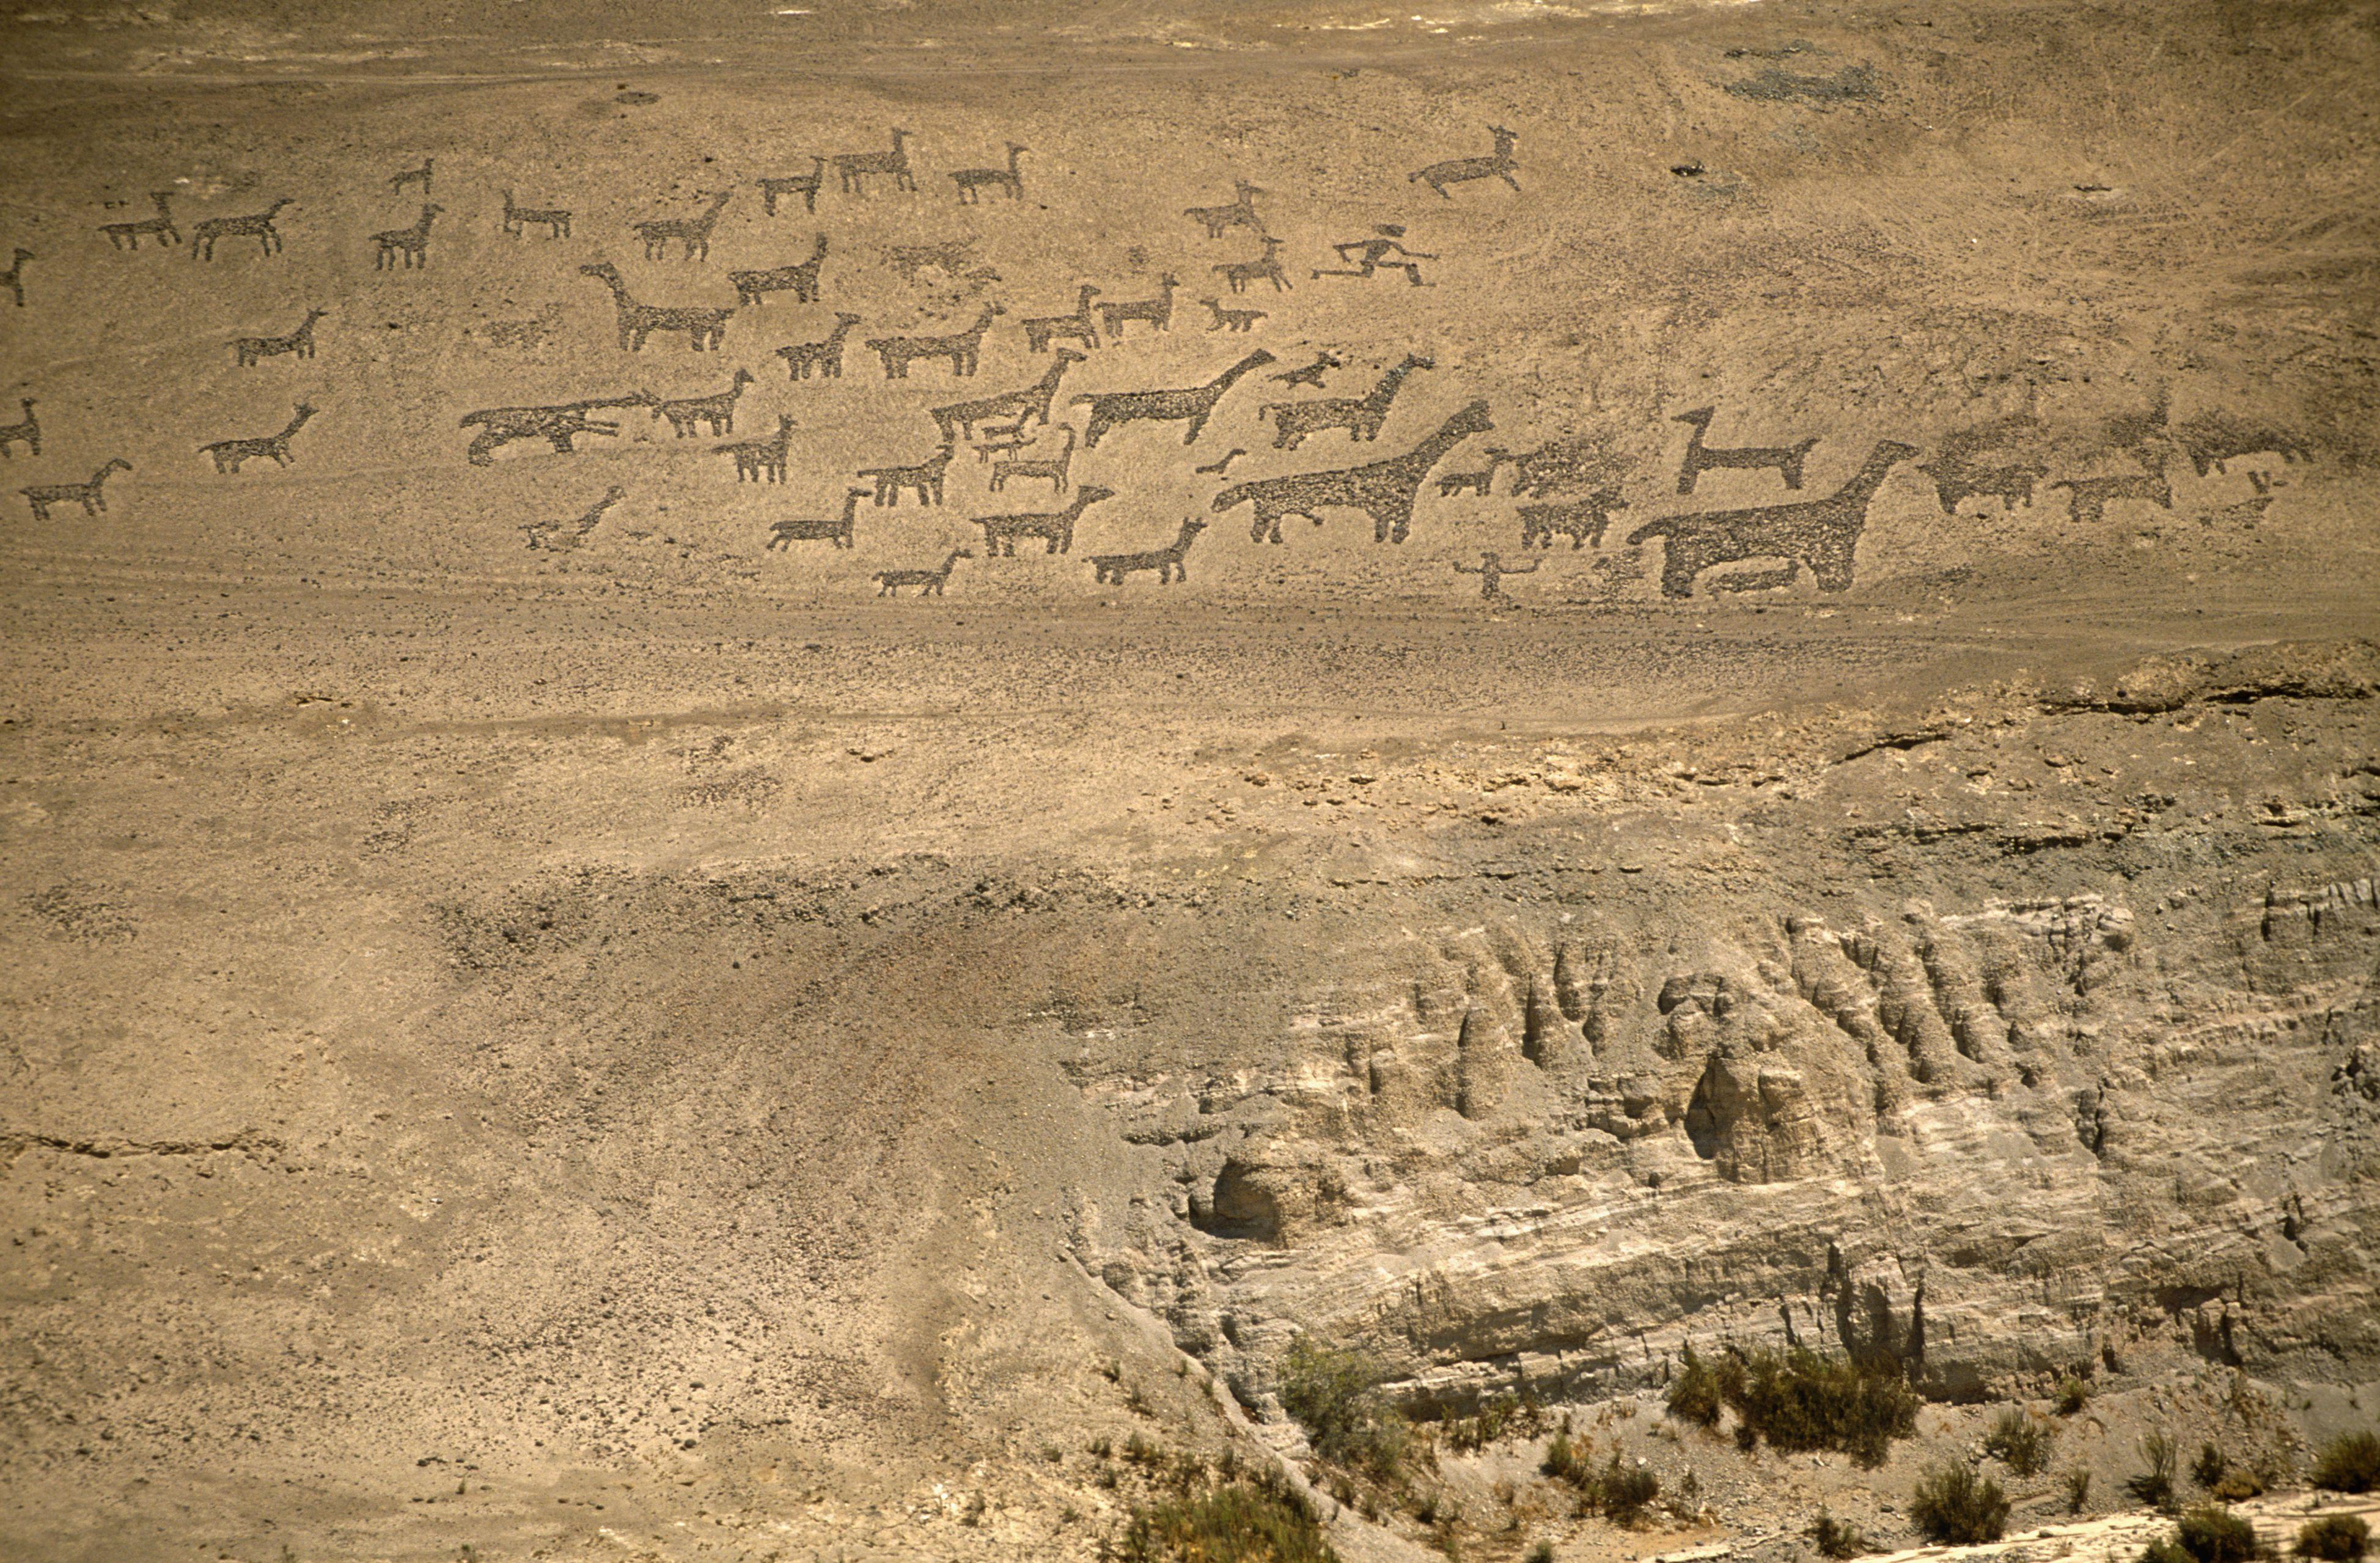 Chile, Region I, Tiliviche. Geoglyphs on a mountainside near Tiliviche, Northern Chile- representations of Llamas & Alpacas